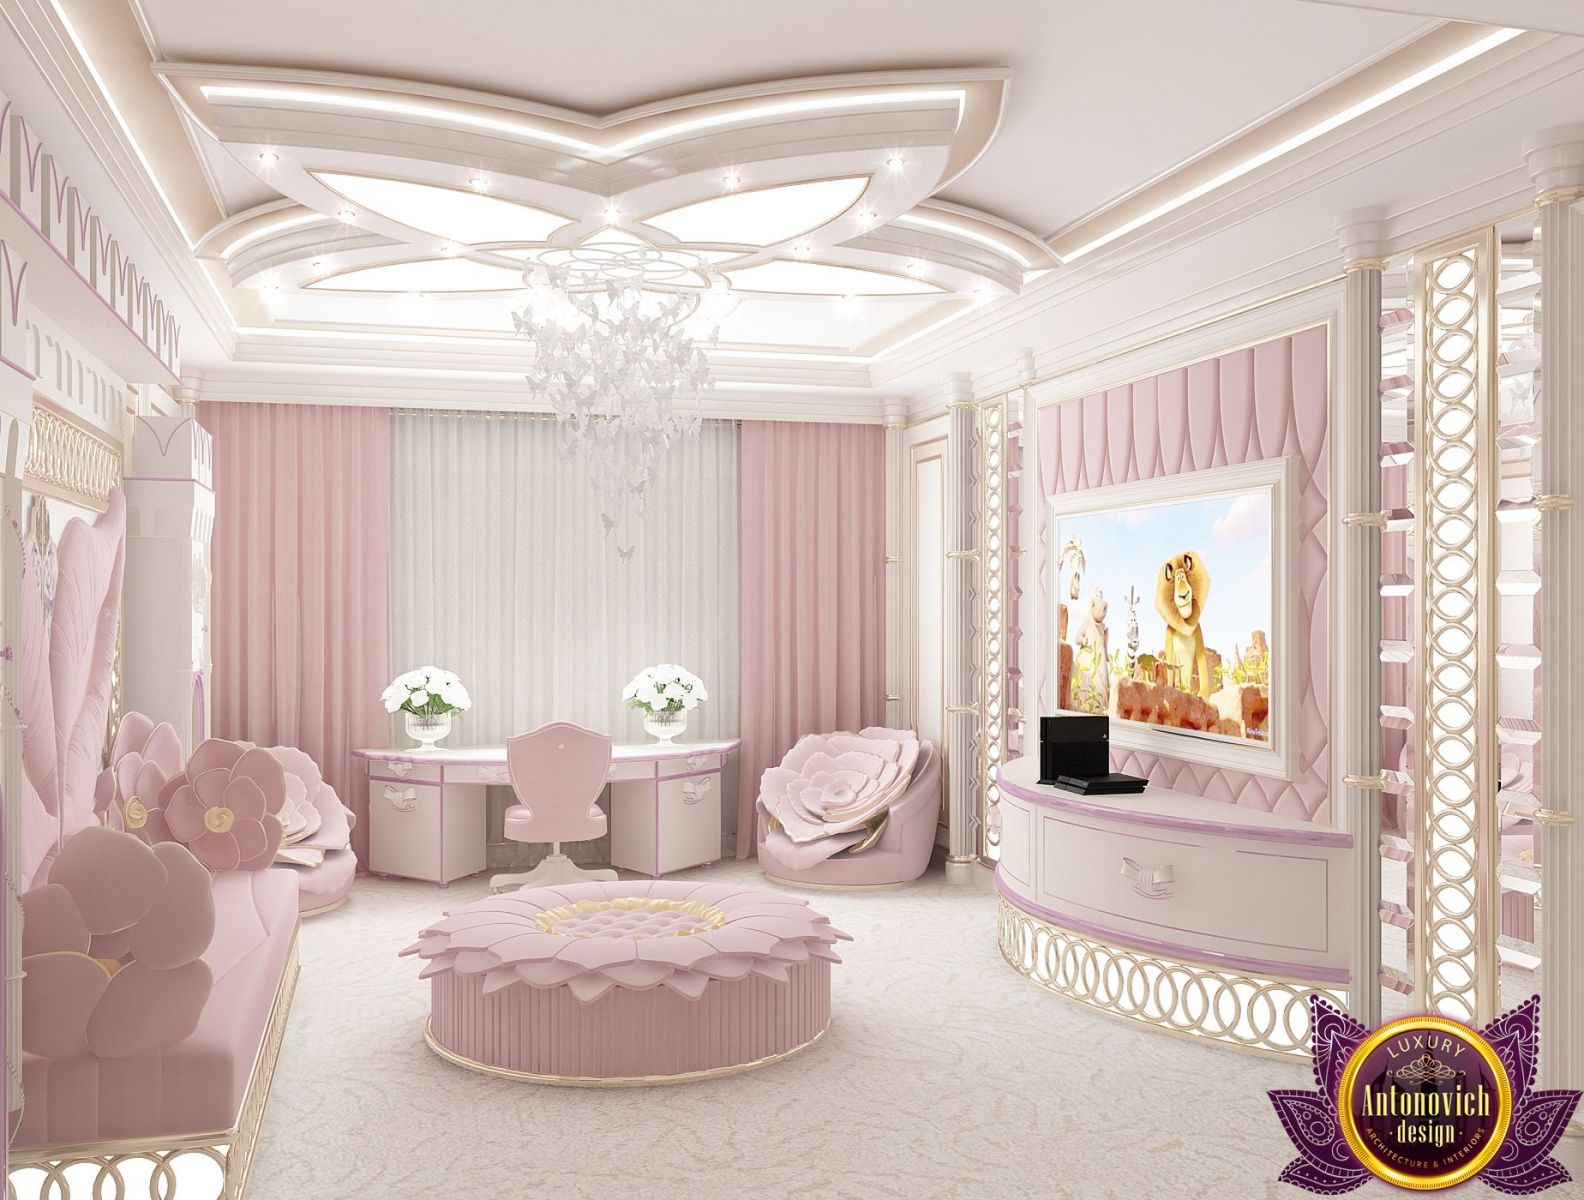 Royal Interior Design For A A Teenage Girl